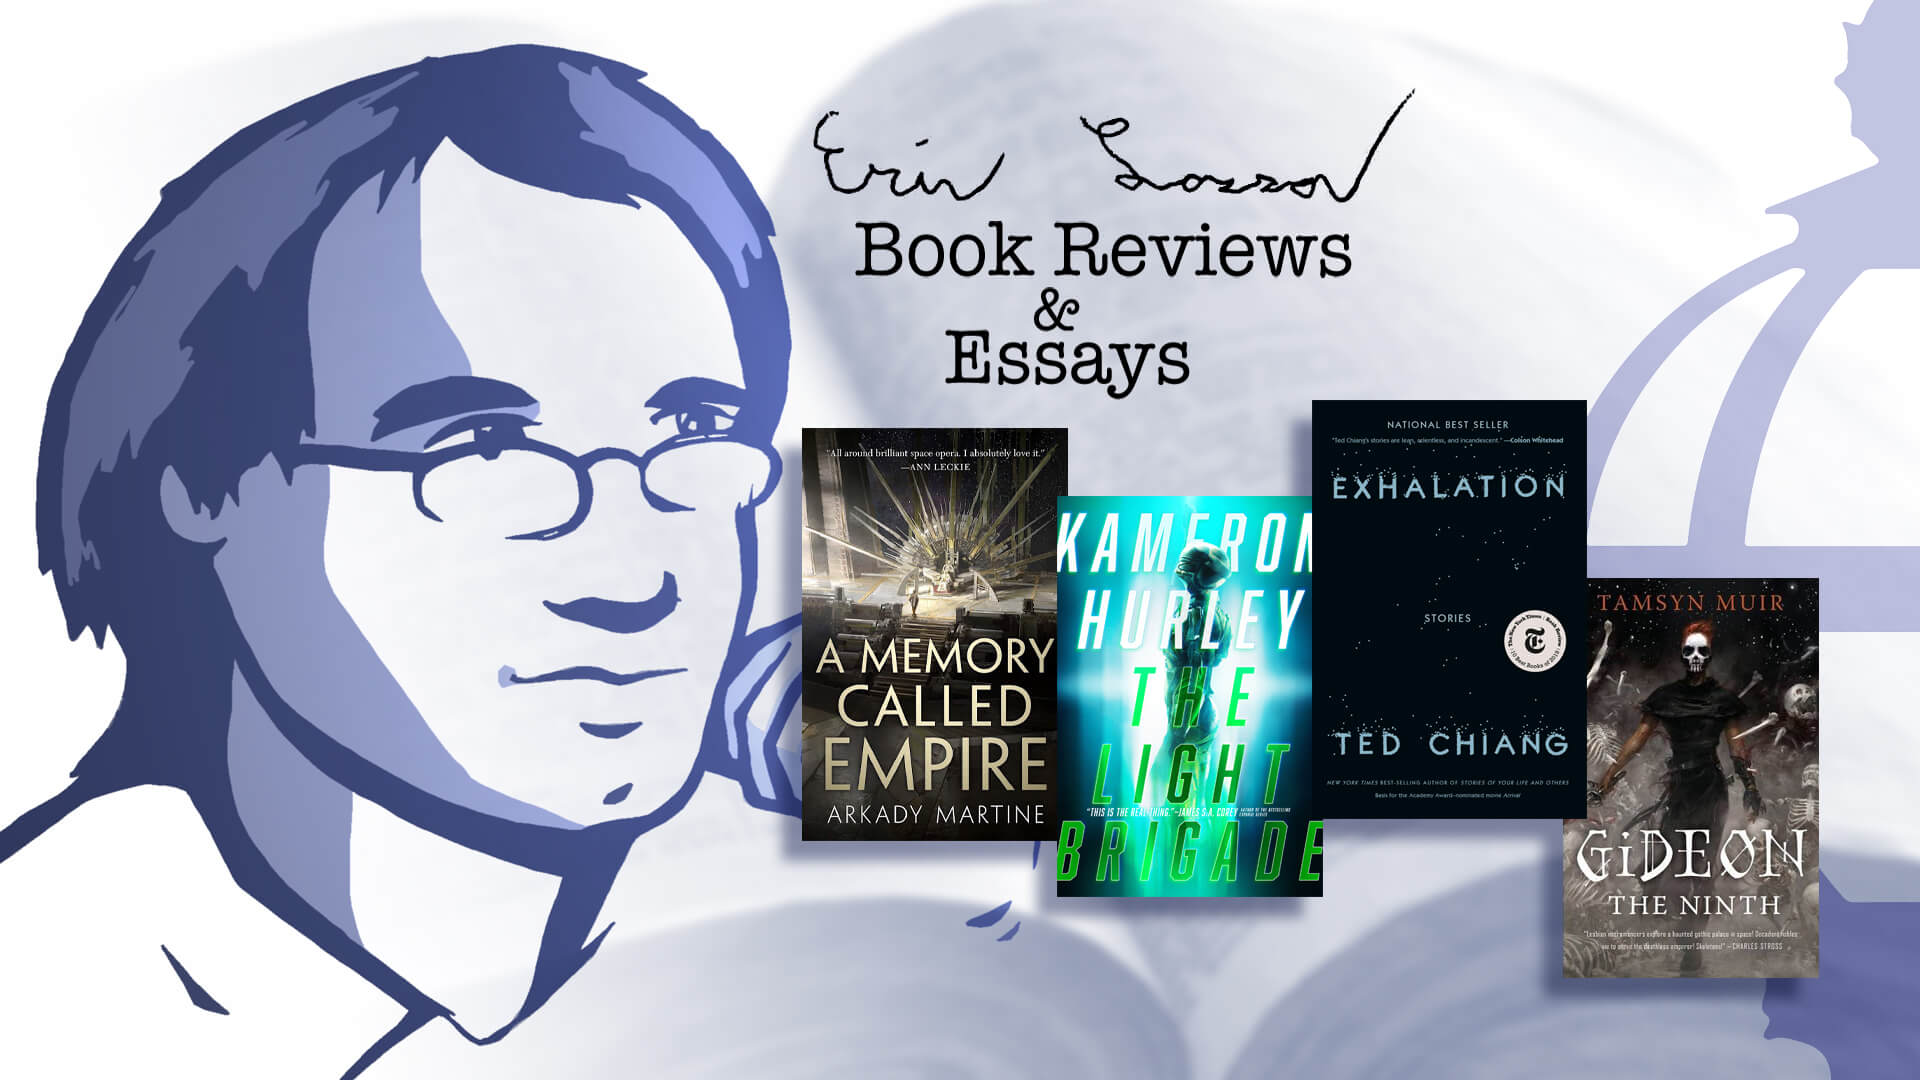 Erin Larson Book Reviews & Essays